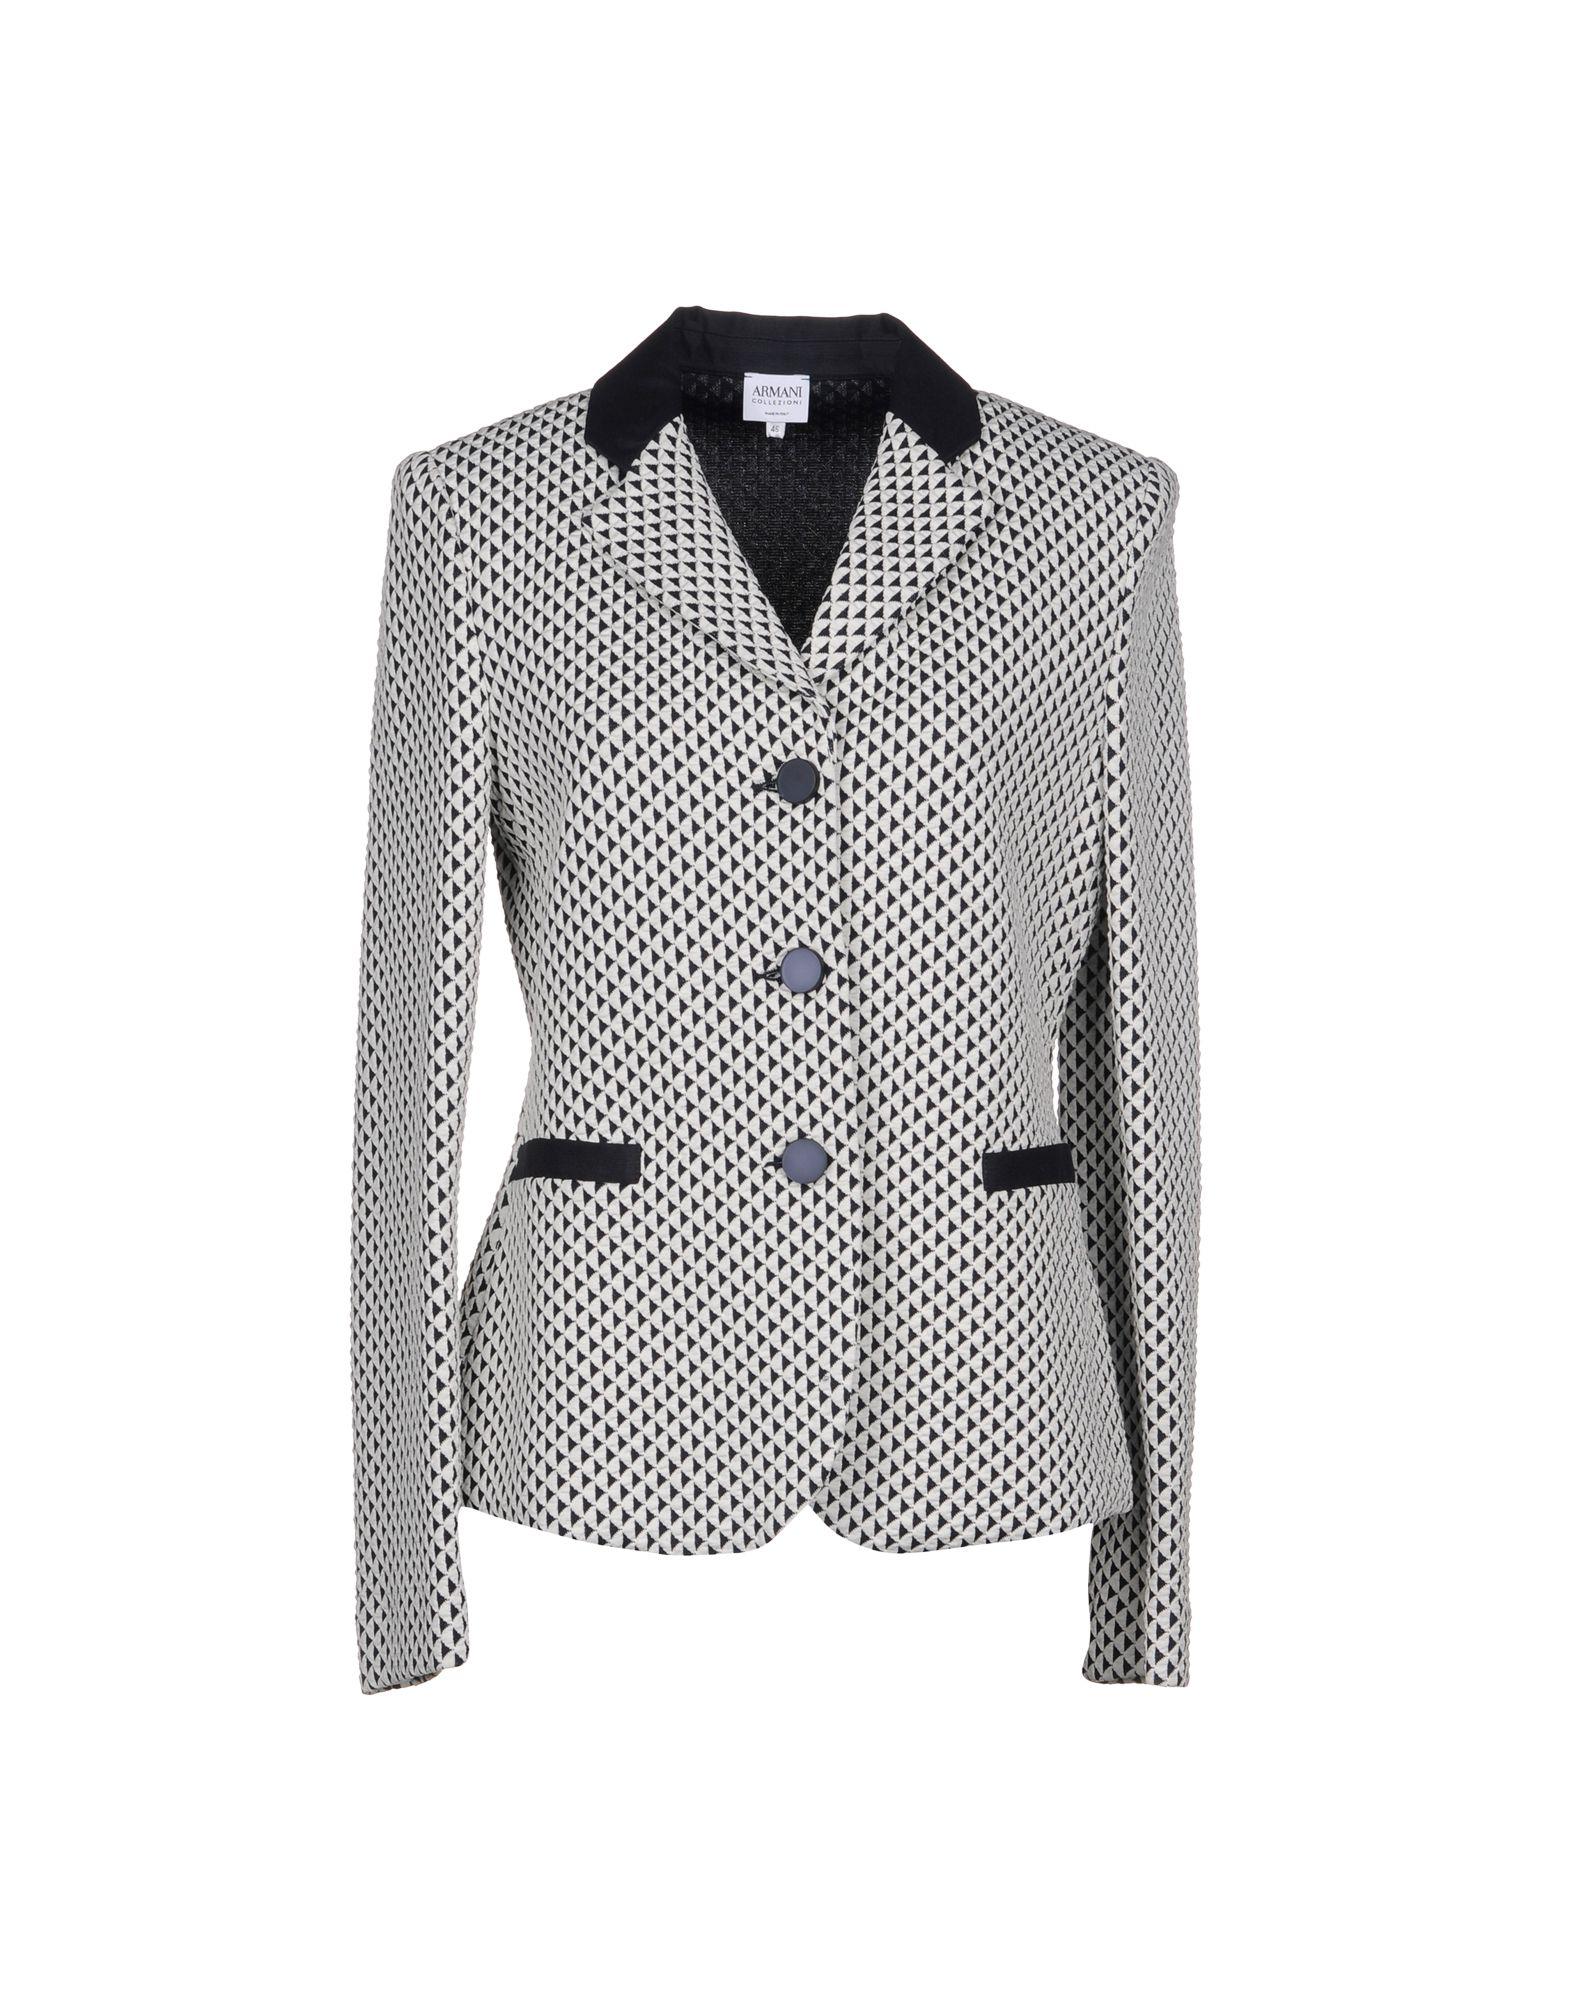 ARMANI COLLEZIONI Damen Jackett Farbe Weiß Größe 7